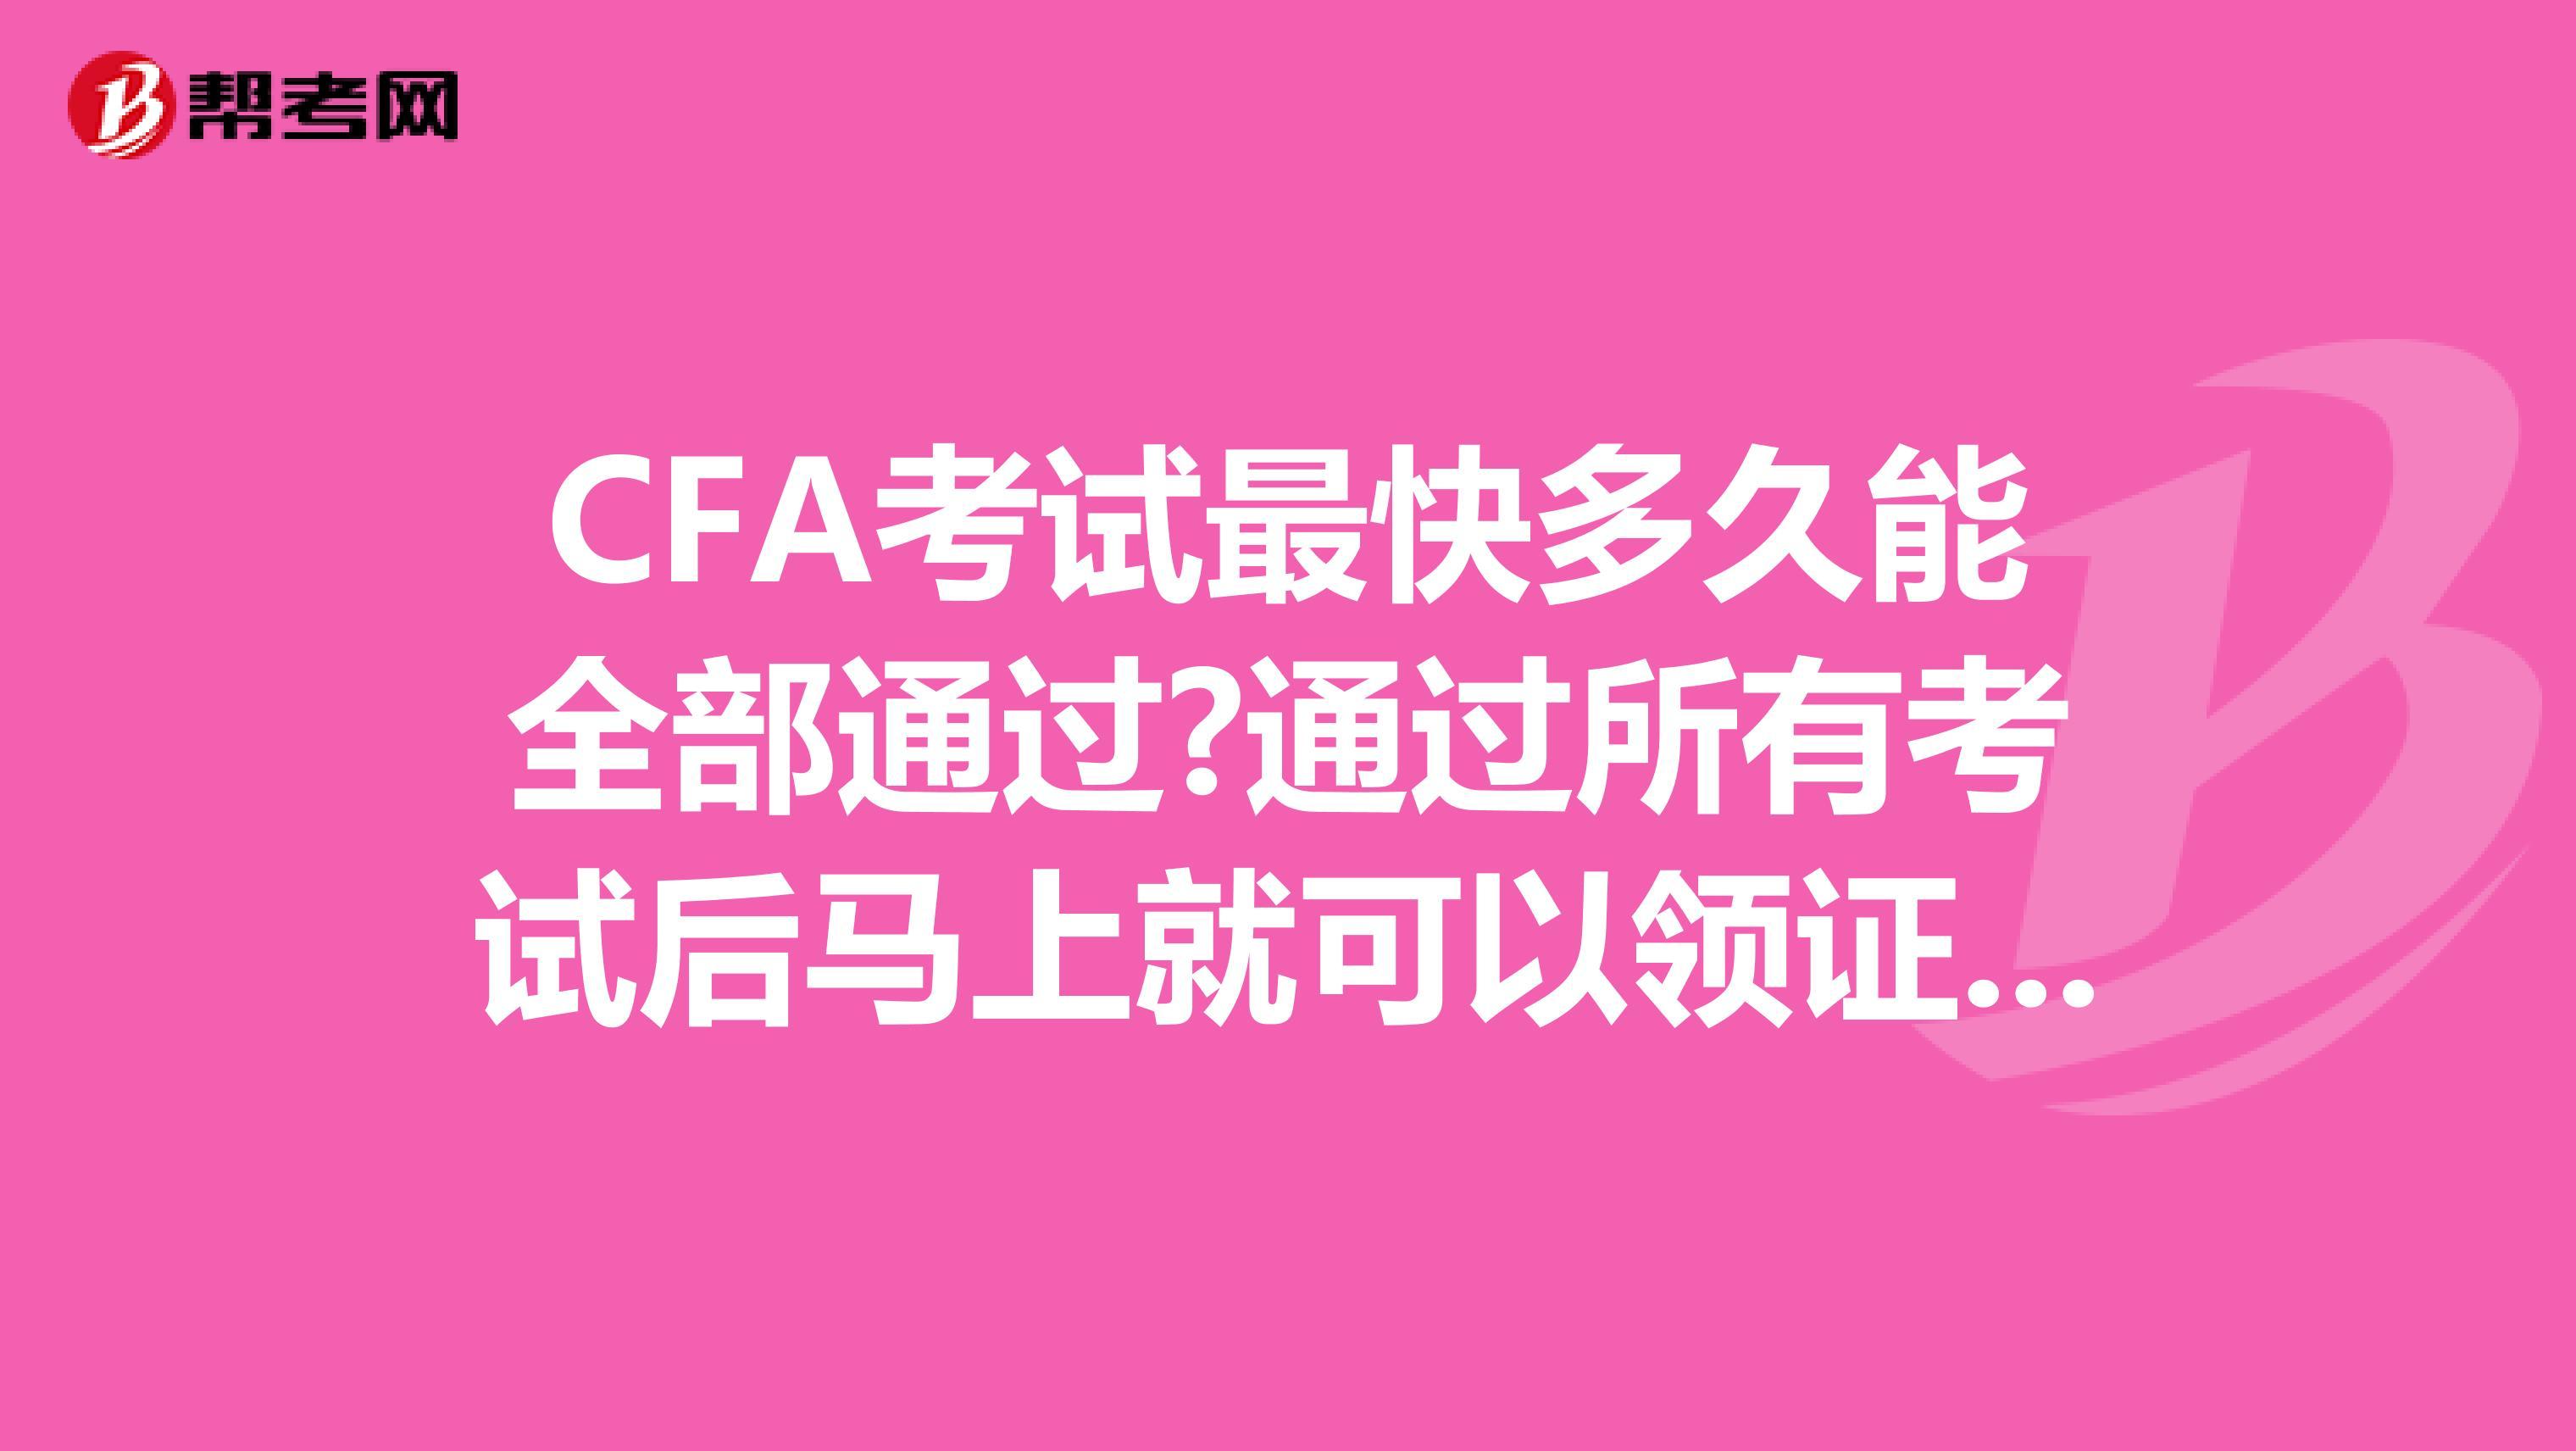 CFA考試最快多久能全部通過?通過所有考試后馬上就可以領證嗎?